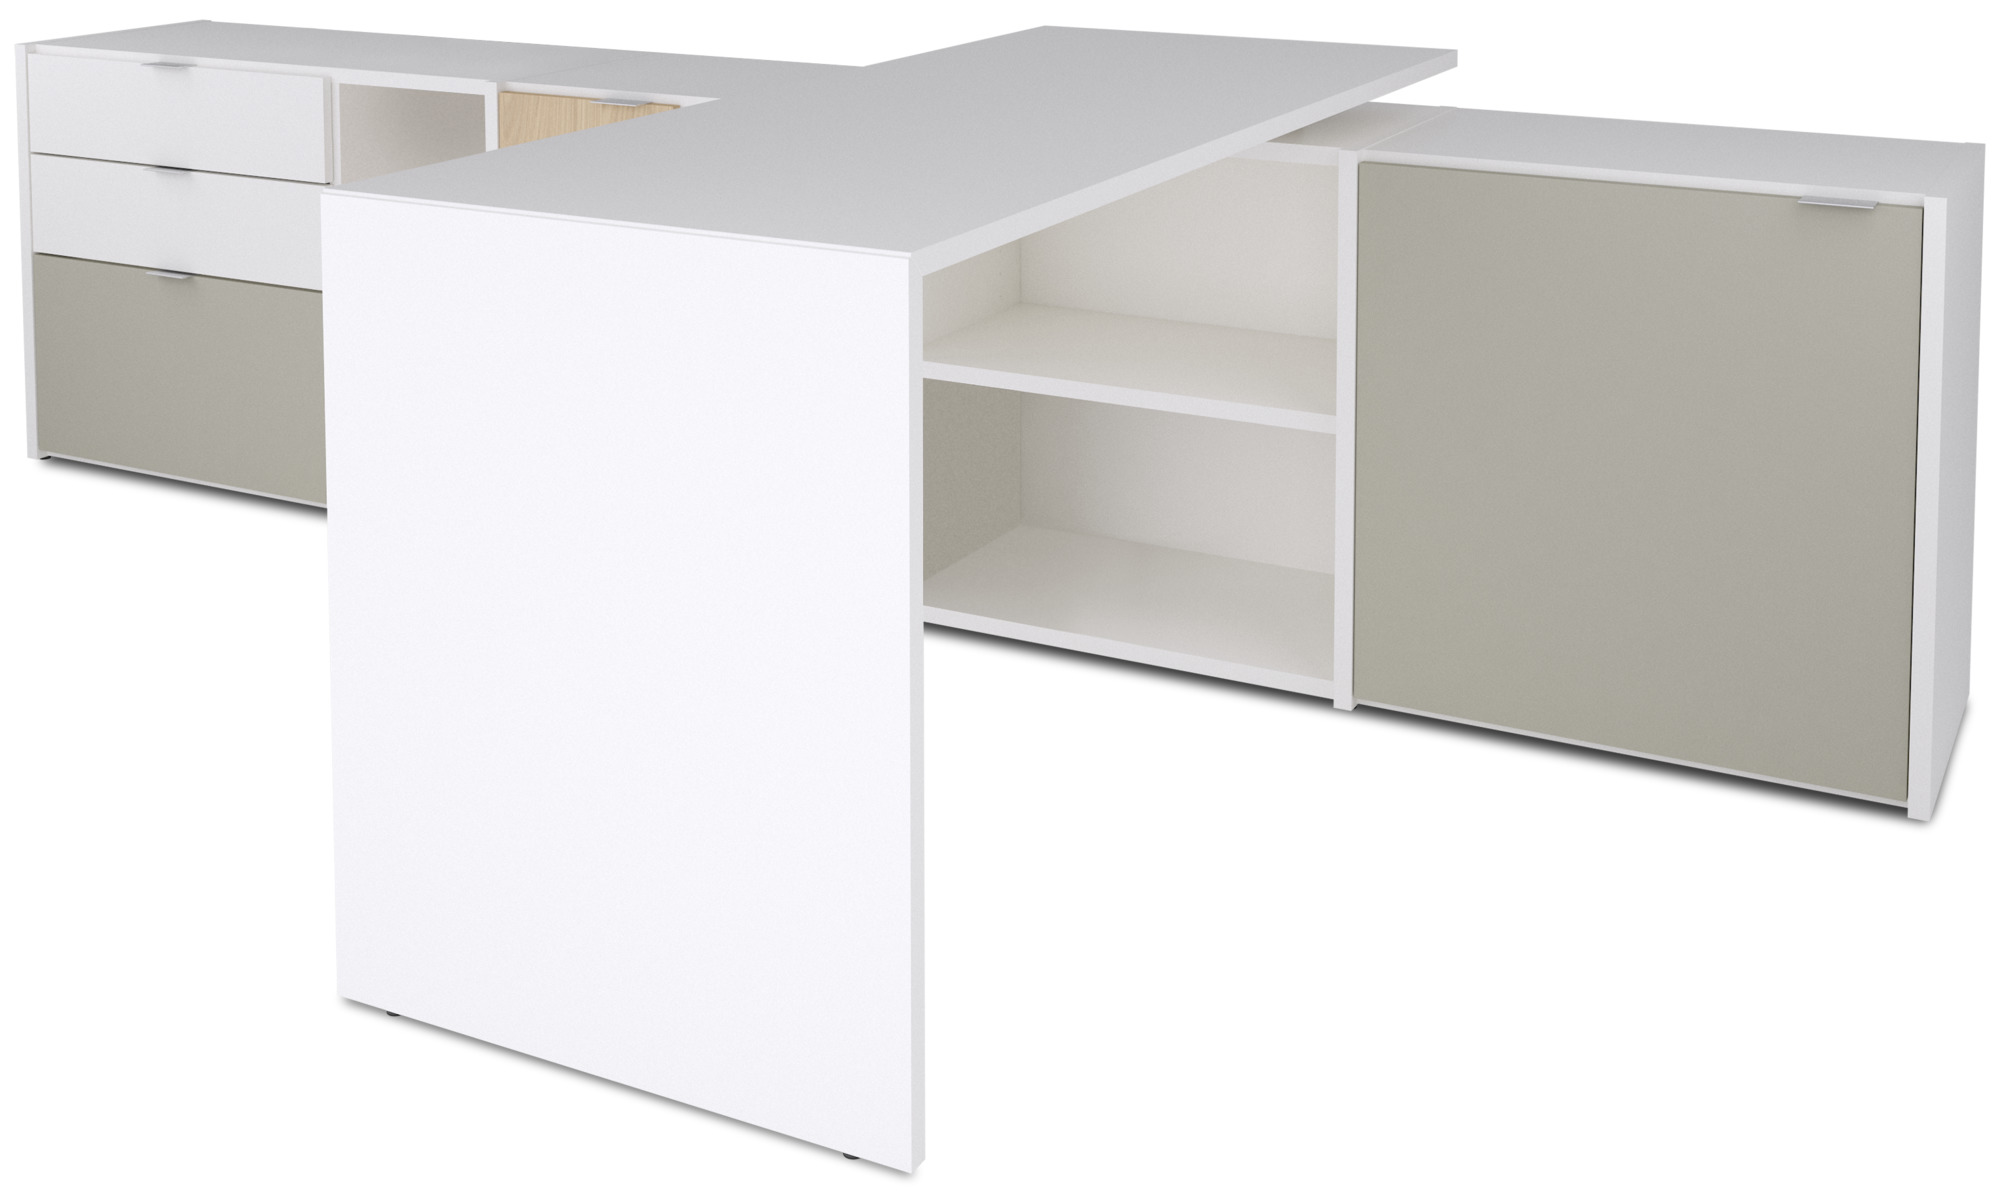 Desks Copenhagen Office System White Lacquered